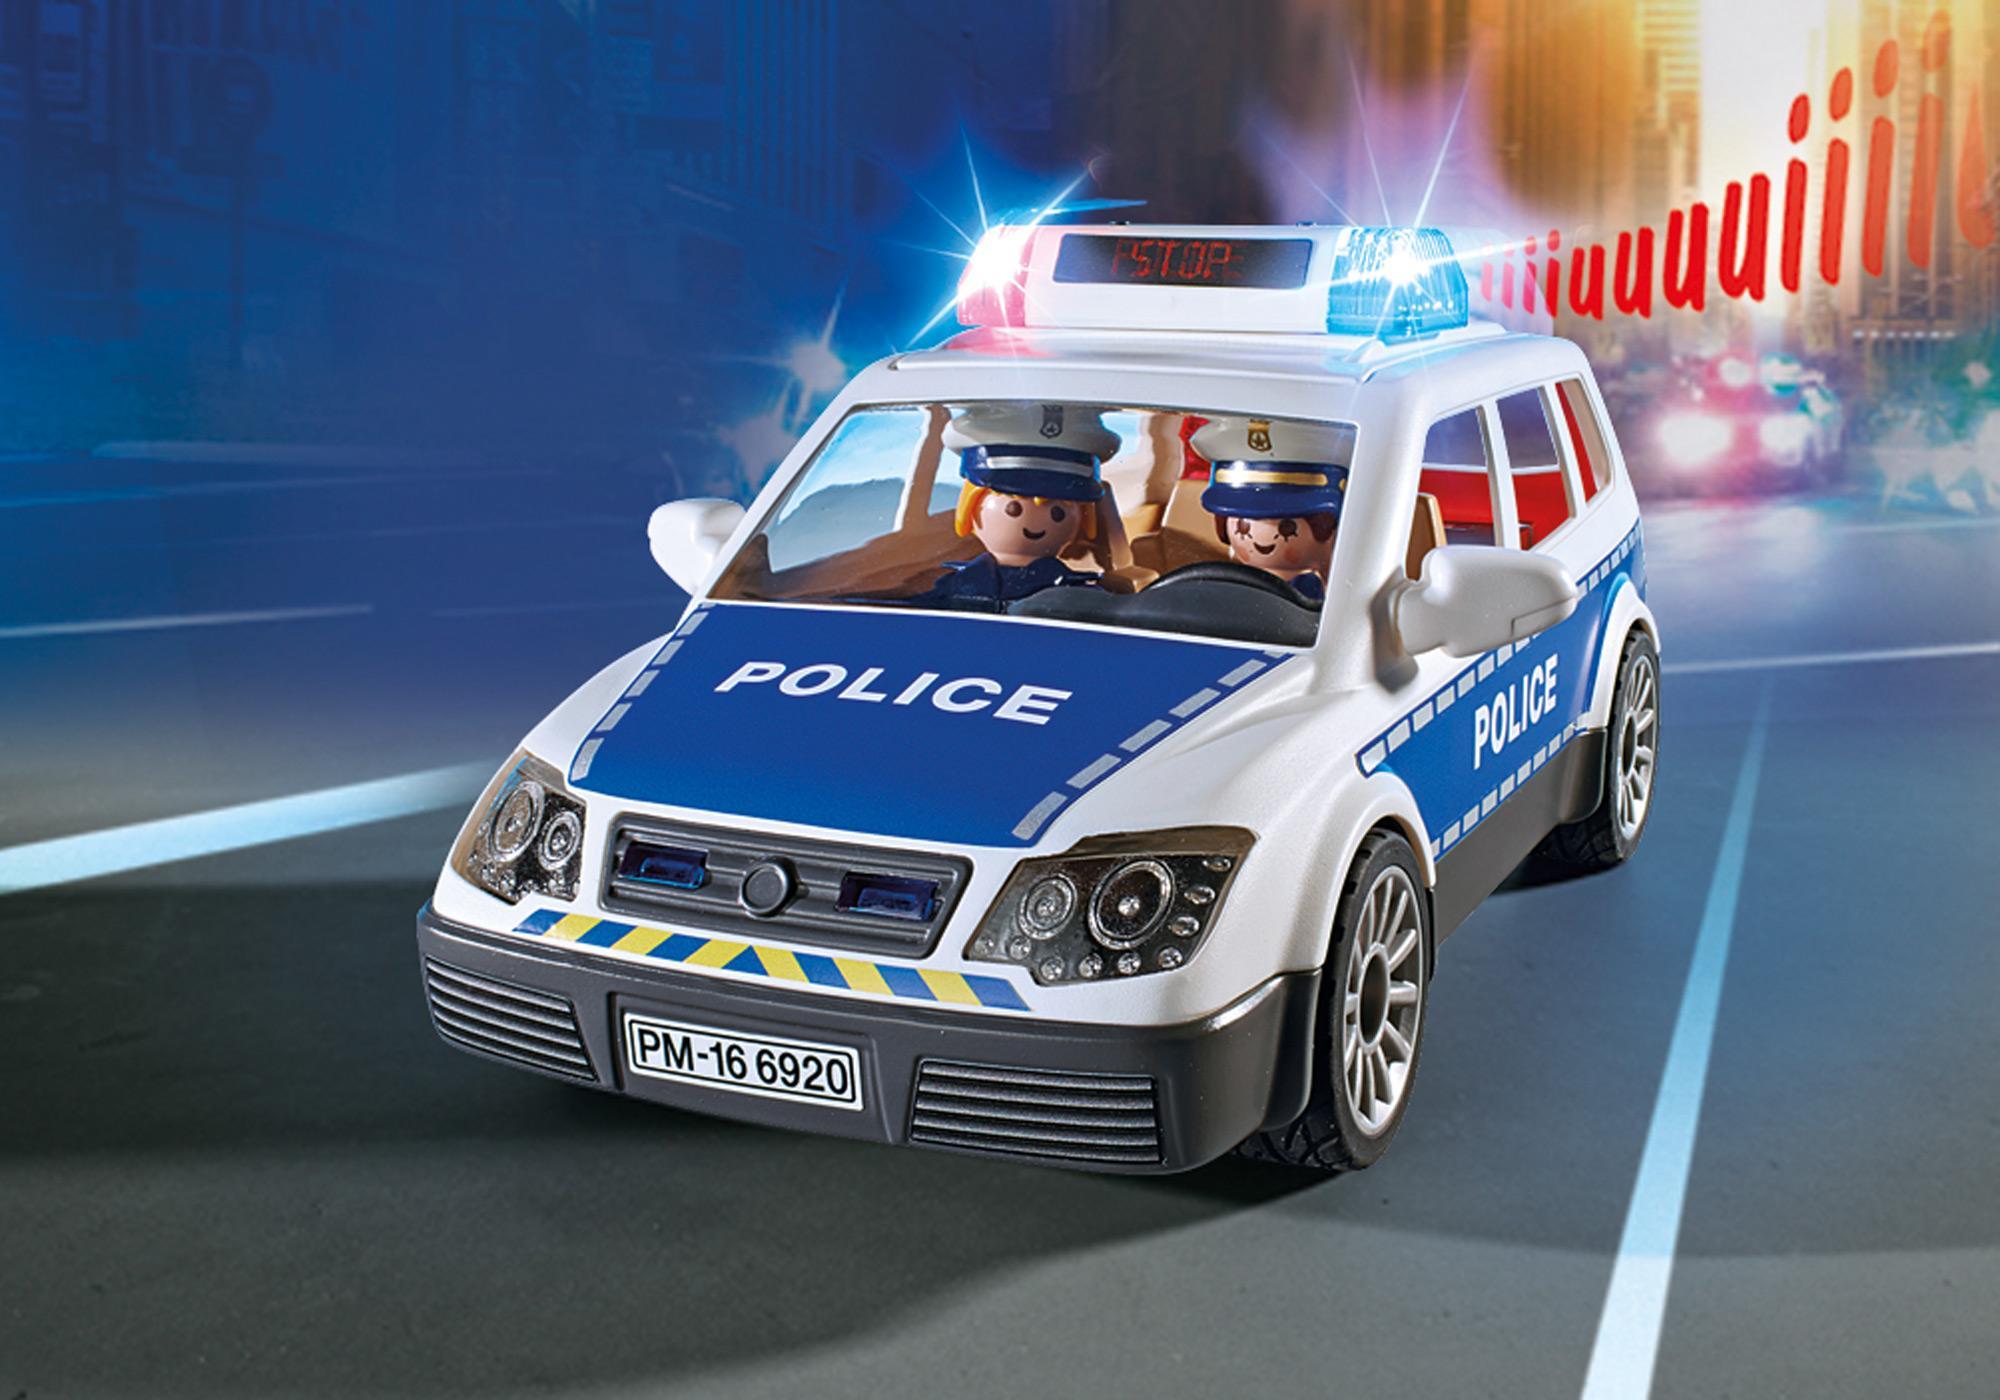 http://media.playmobil.com/i/playmobil/6920_product_extra3/Coche de Policía con Luces y Sonido